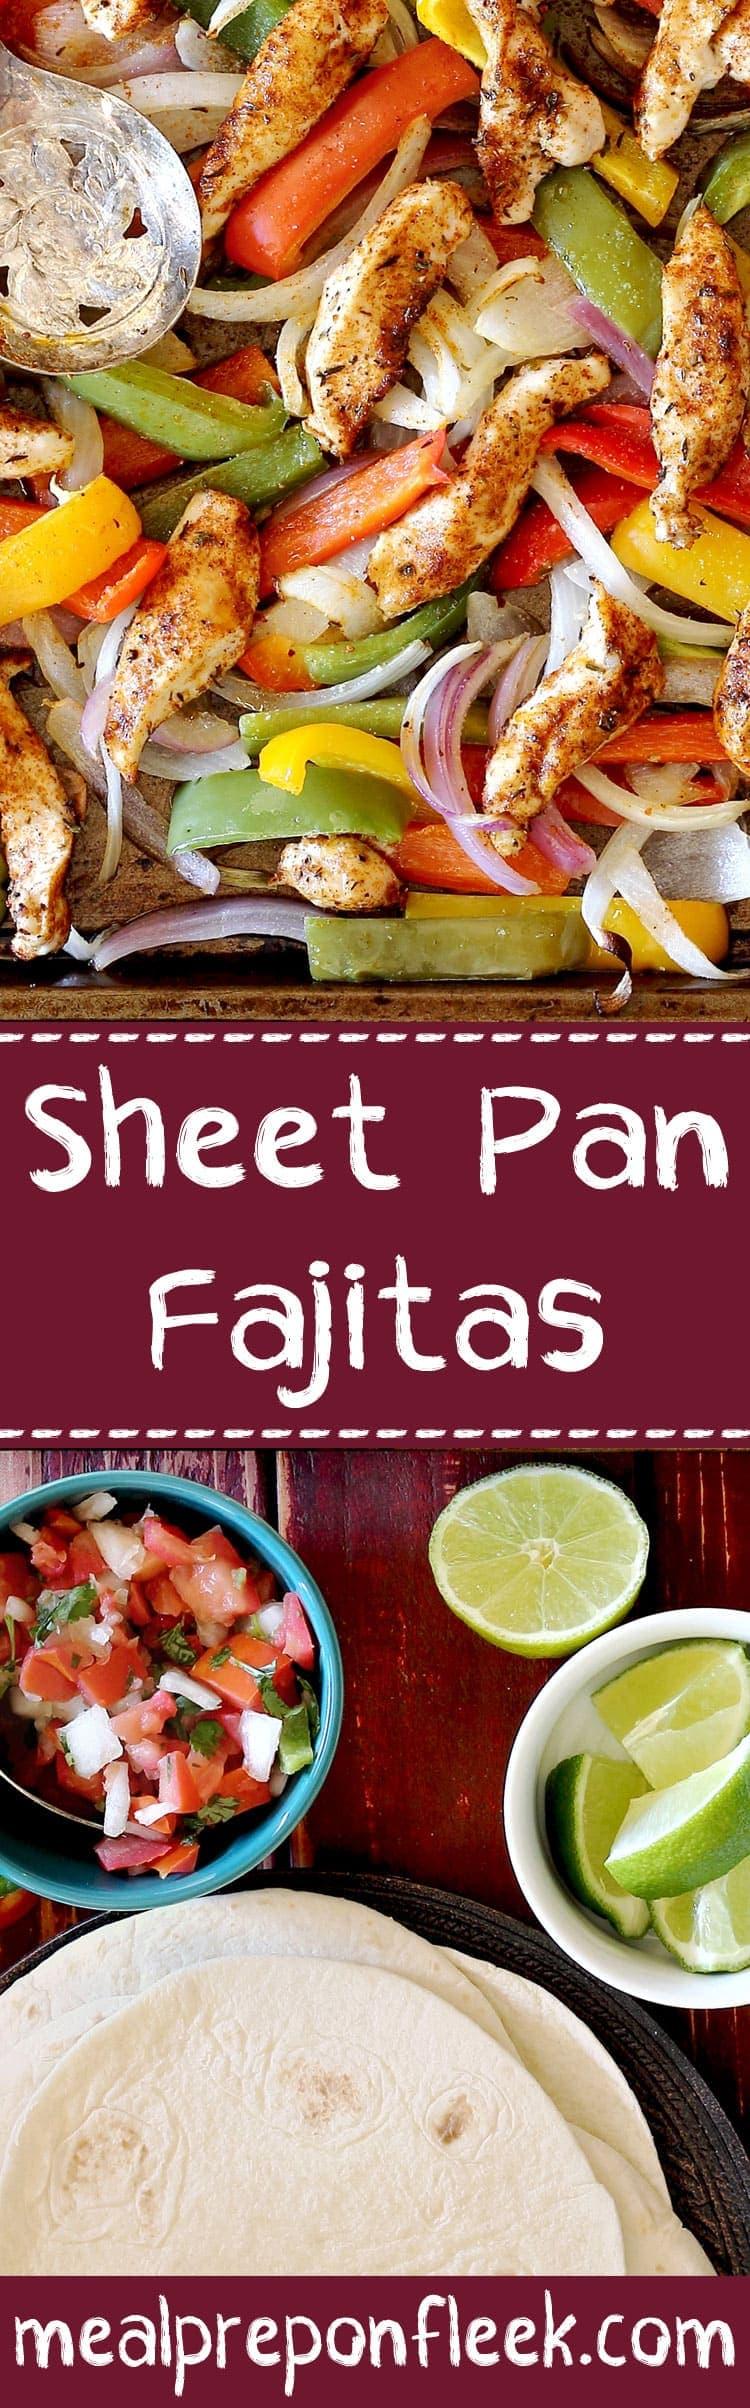 One Pan Steak Fajitas Meal Prep